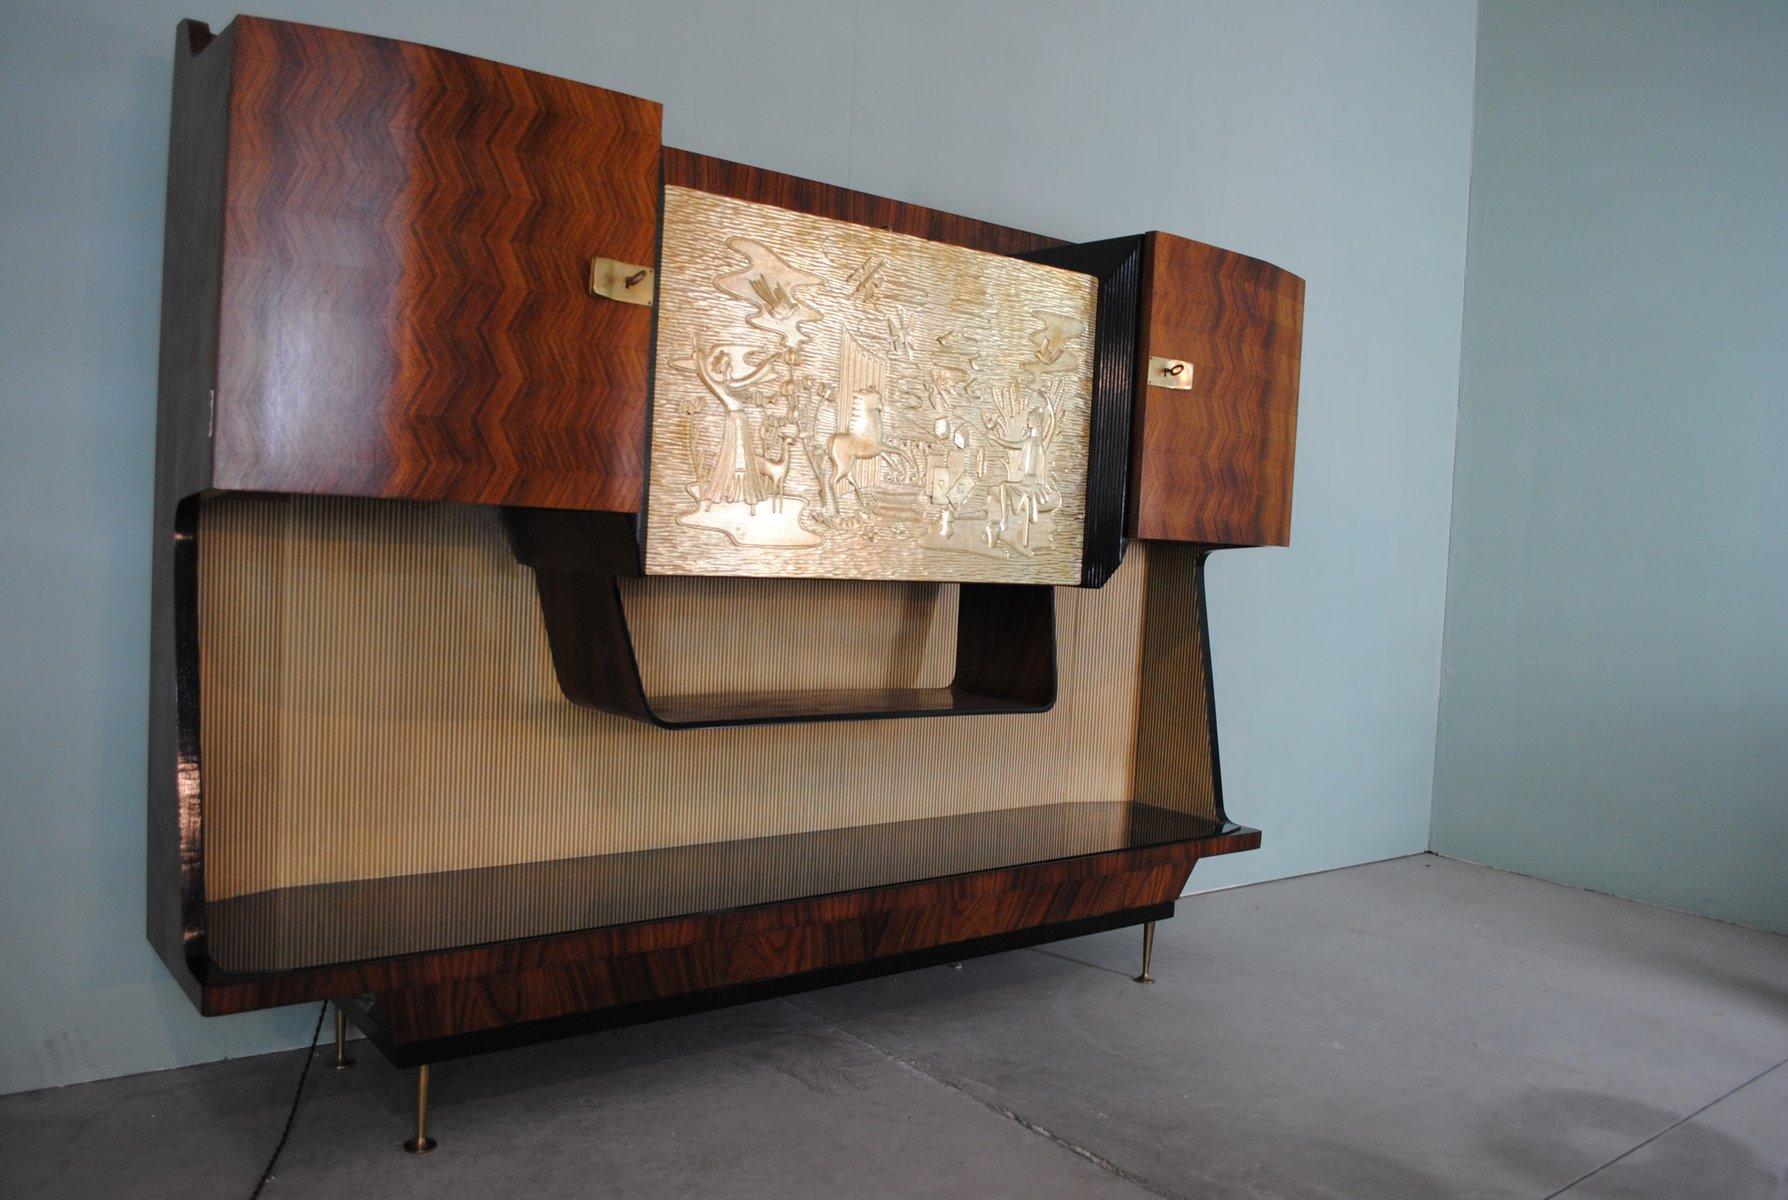 italienischer vintage barschrank von osvaldo borsani bei pamono kaufen. Black Bedroom Furniture Sets. Home Design Ideas